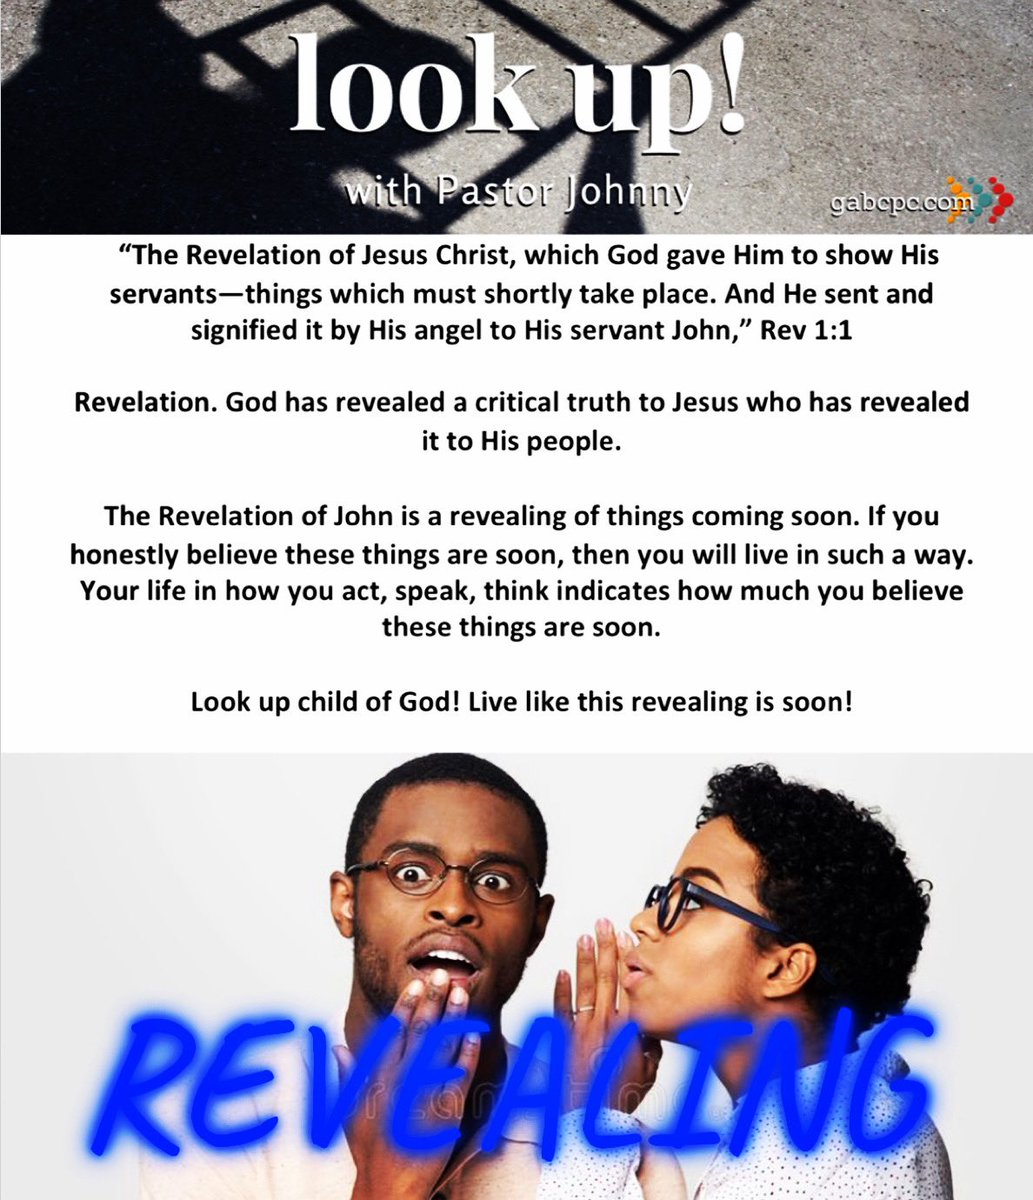 REVEALING.  @goldenacresbc #gabcpc #lookup #childofgod #revealing #drjohnnyellison #revelation #devotion #devotional